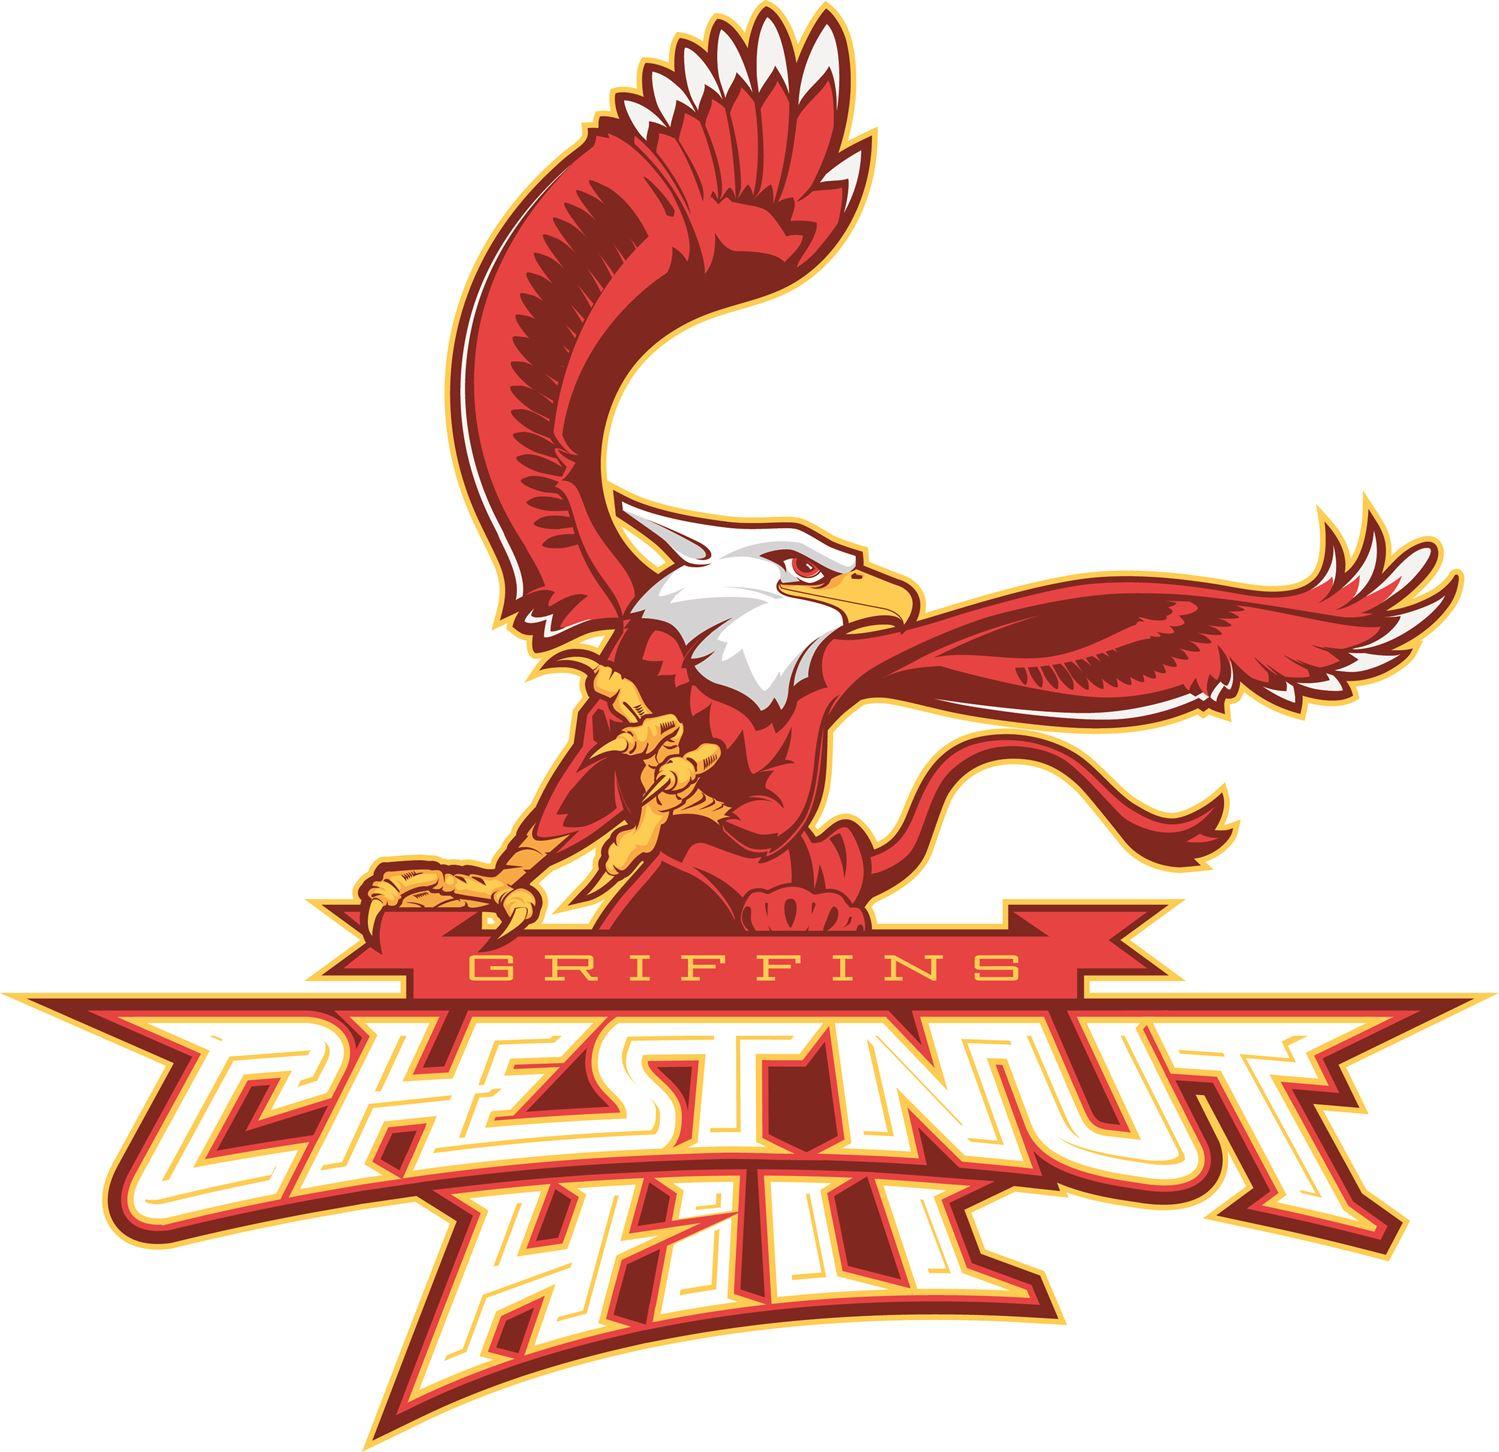 Chestnut Hill College - Chestnut Hill Men's Lacrosse